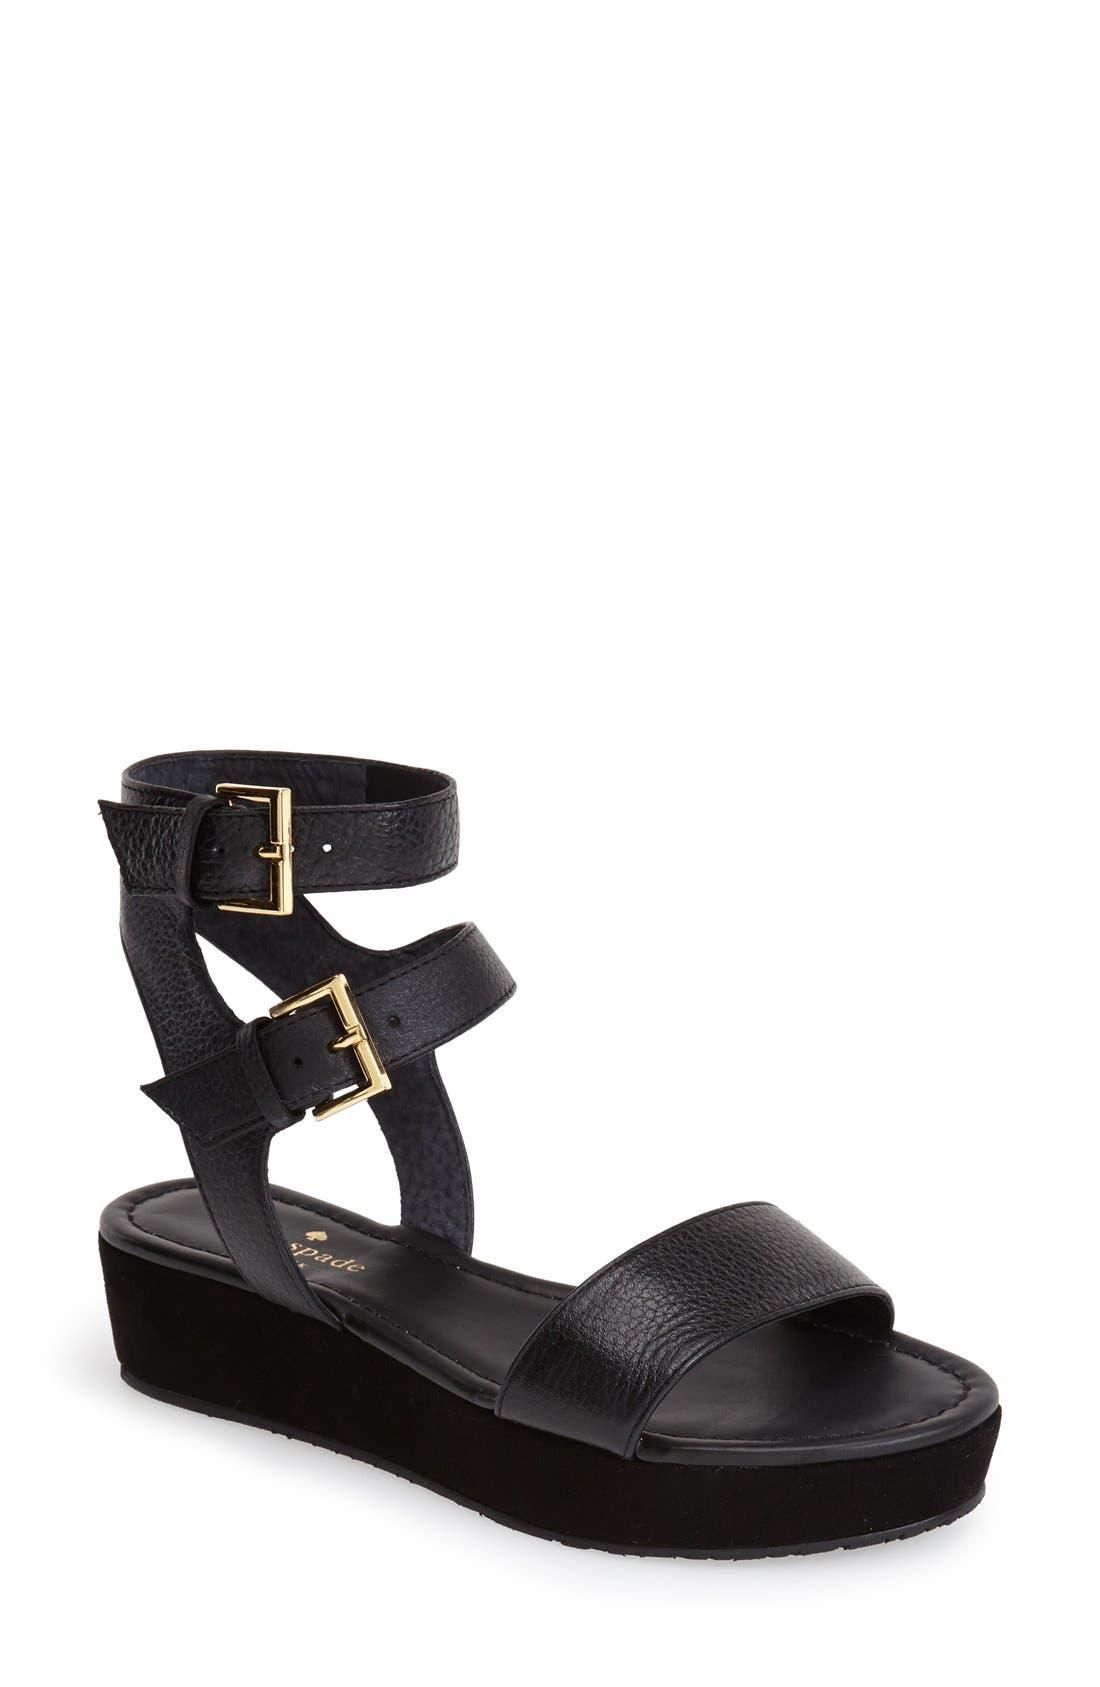 Alternate Image 1 Selected - kate spade new york 'troy' platform sandal (Women)